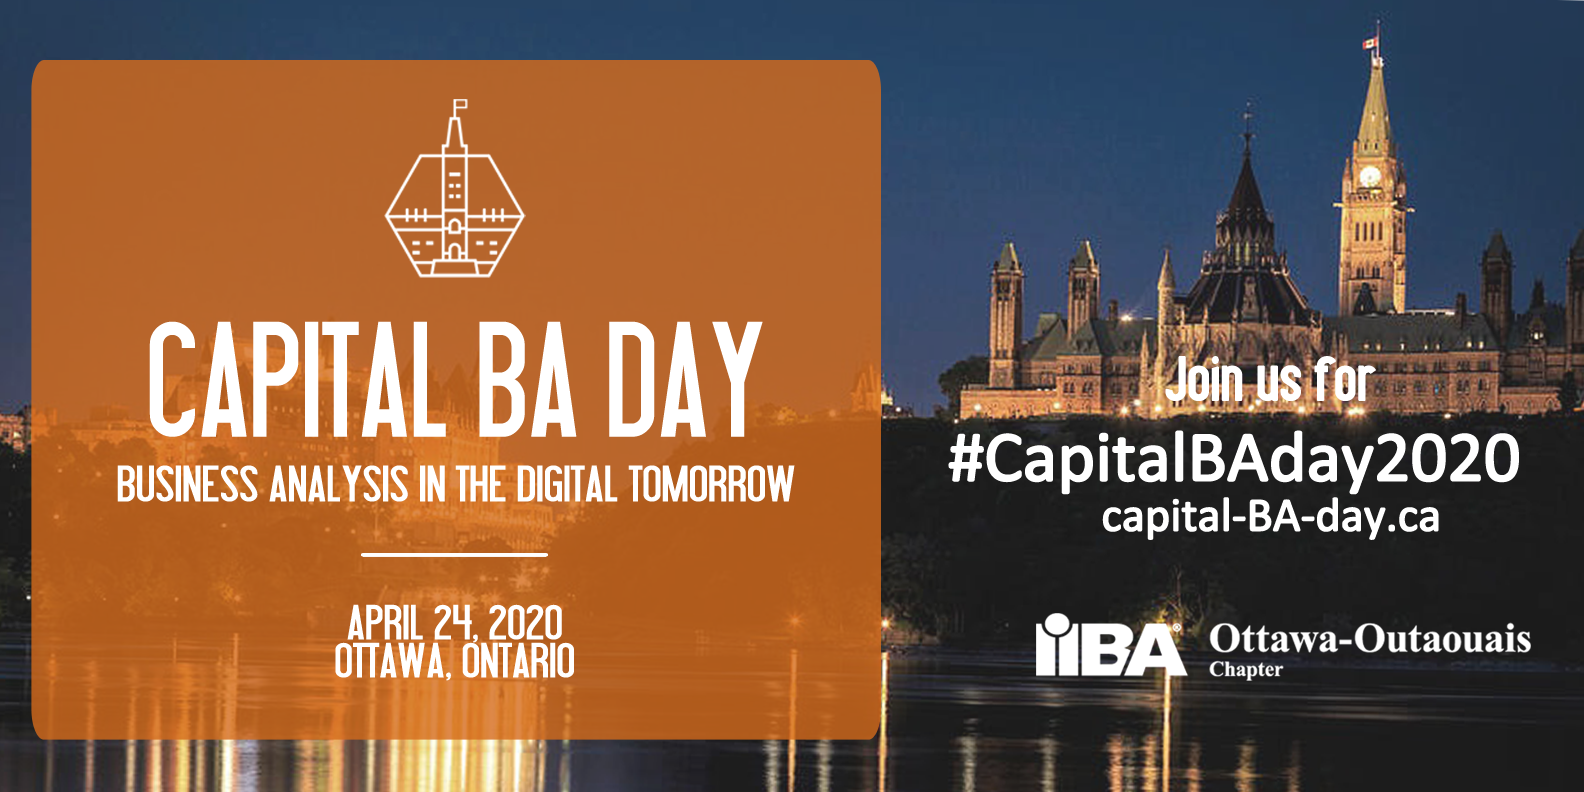 Capital BA Day 2020 | Business Analysis in the Digital Tomorrow